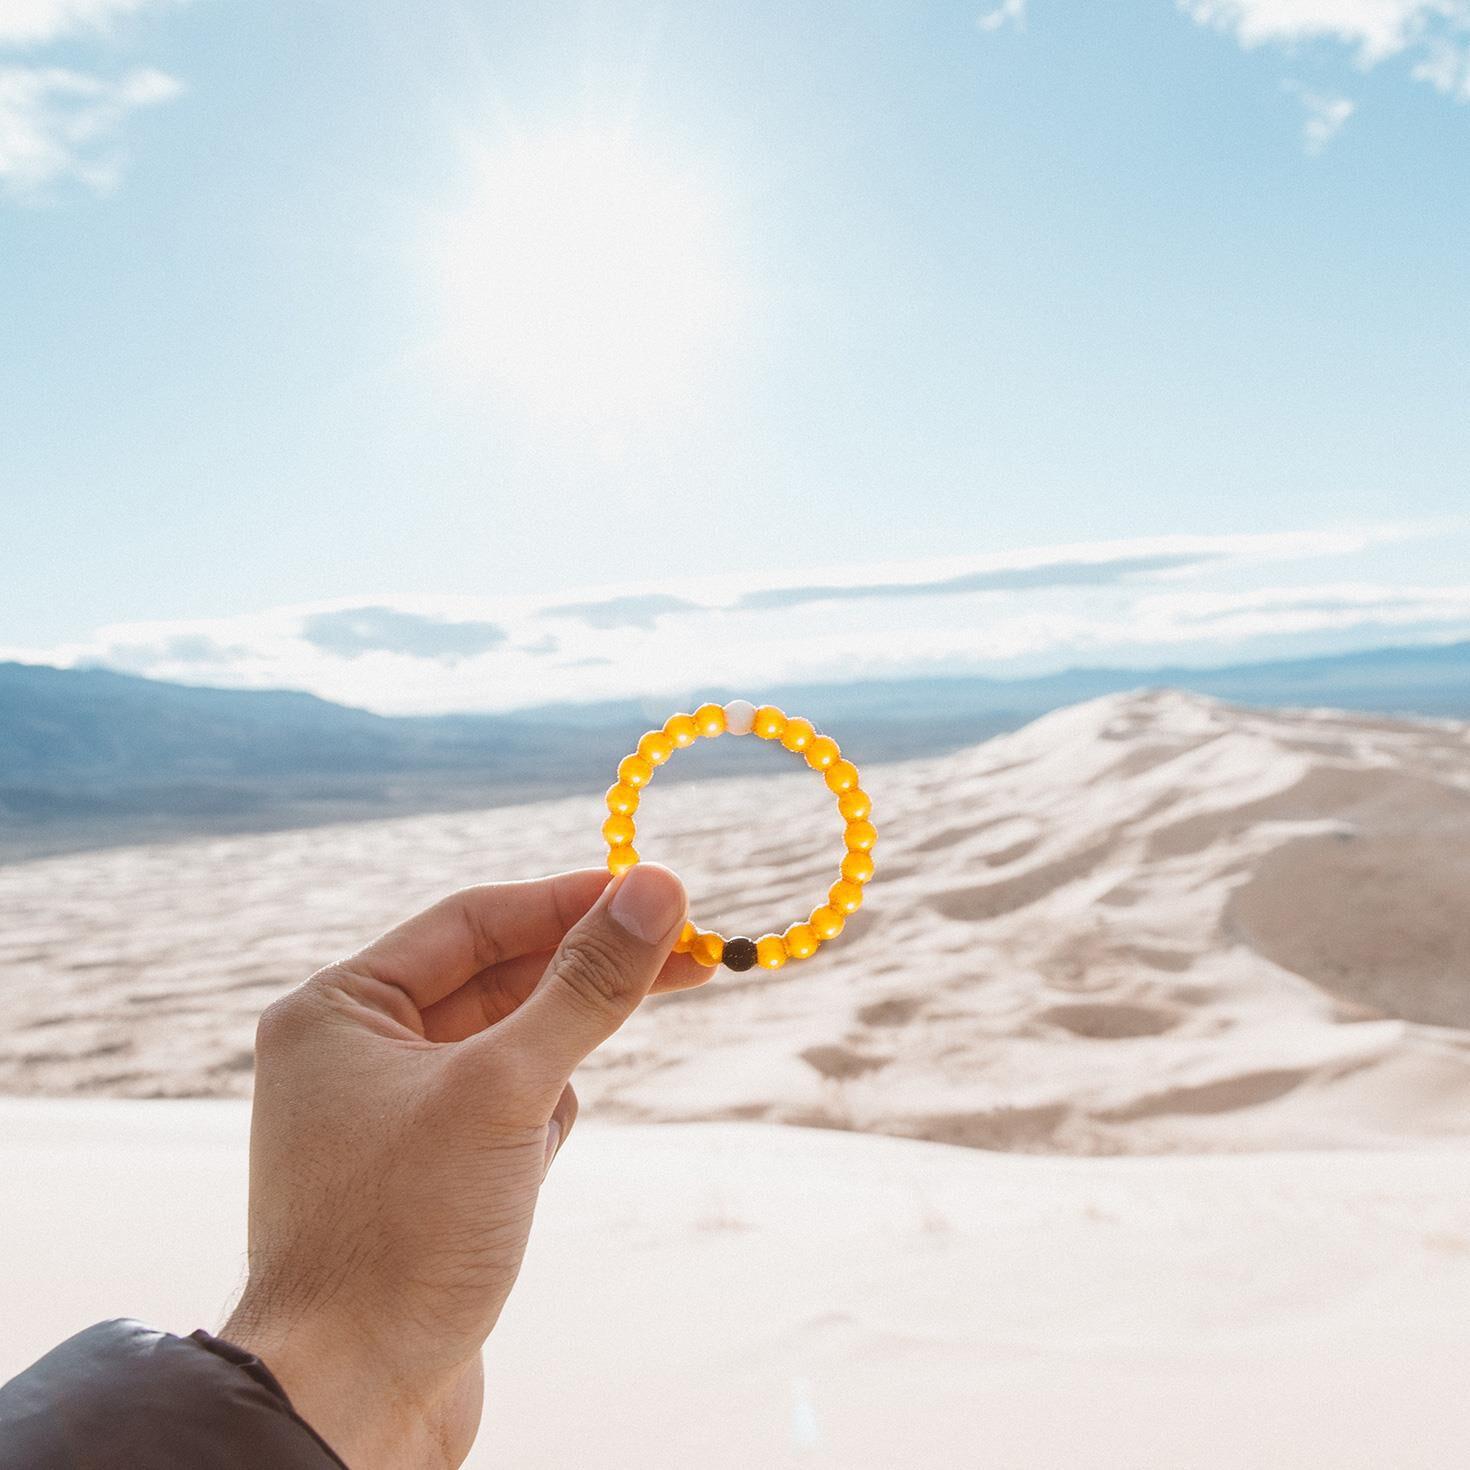 image regarding Lokai Bracelet Meaning Printable named Constrained Version (Orange) Lokai Bracelet, Medium